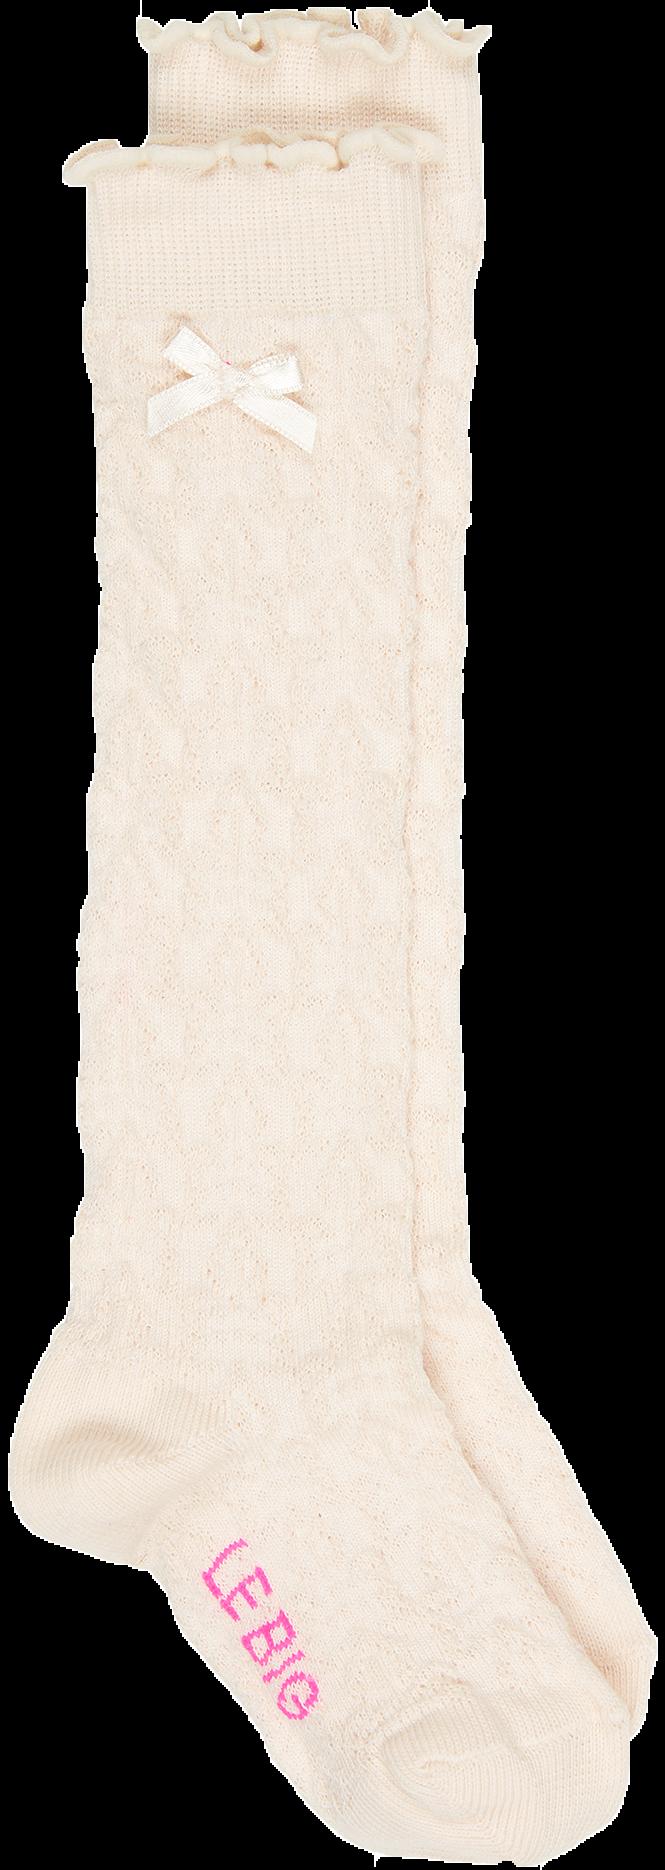 Beige LE BIG Socken MIMI KNEE HIGH uZK6A